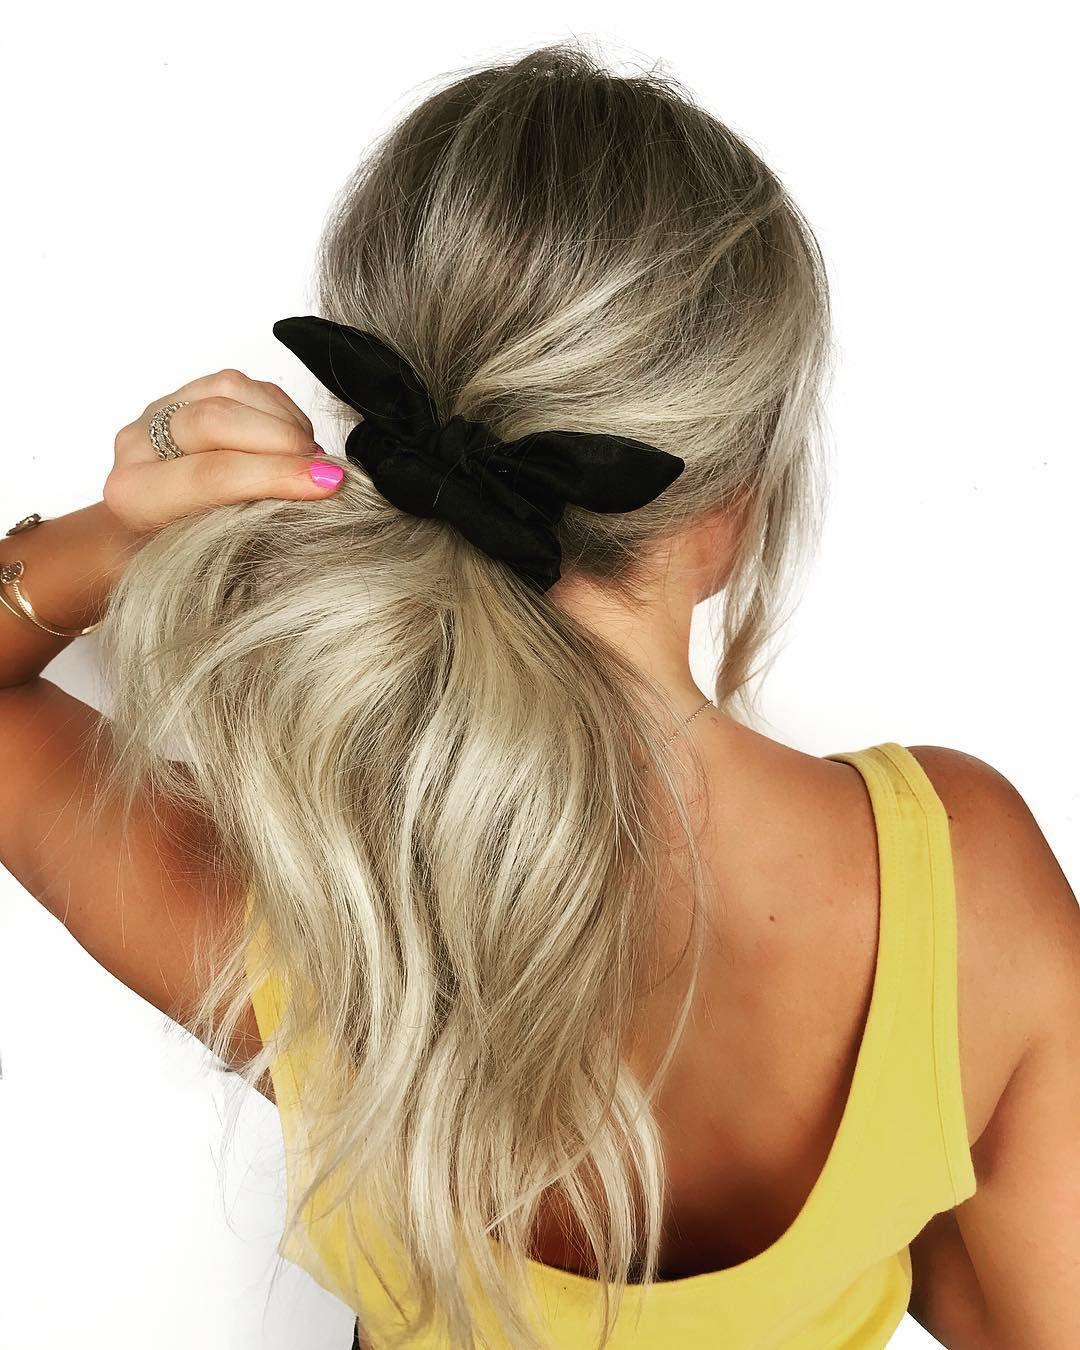 Mane Tail 😉 #manechick #dontbeasidechick #itsalifestyle Manechickshop.com  June 19th 8am PST Model @kati… | High ponytail hairstyles, Hair styles,  Short hair styles